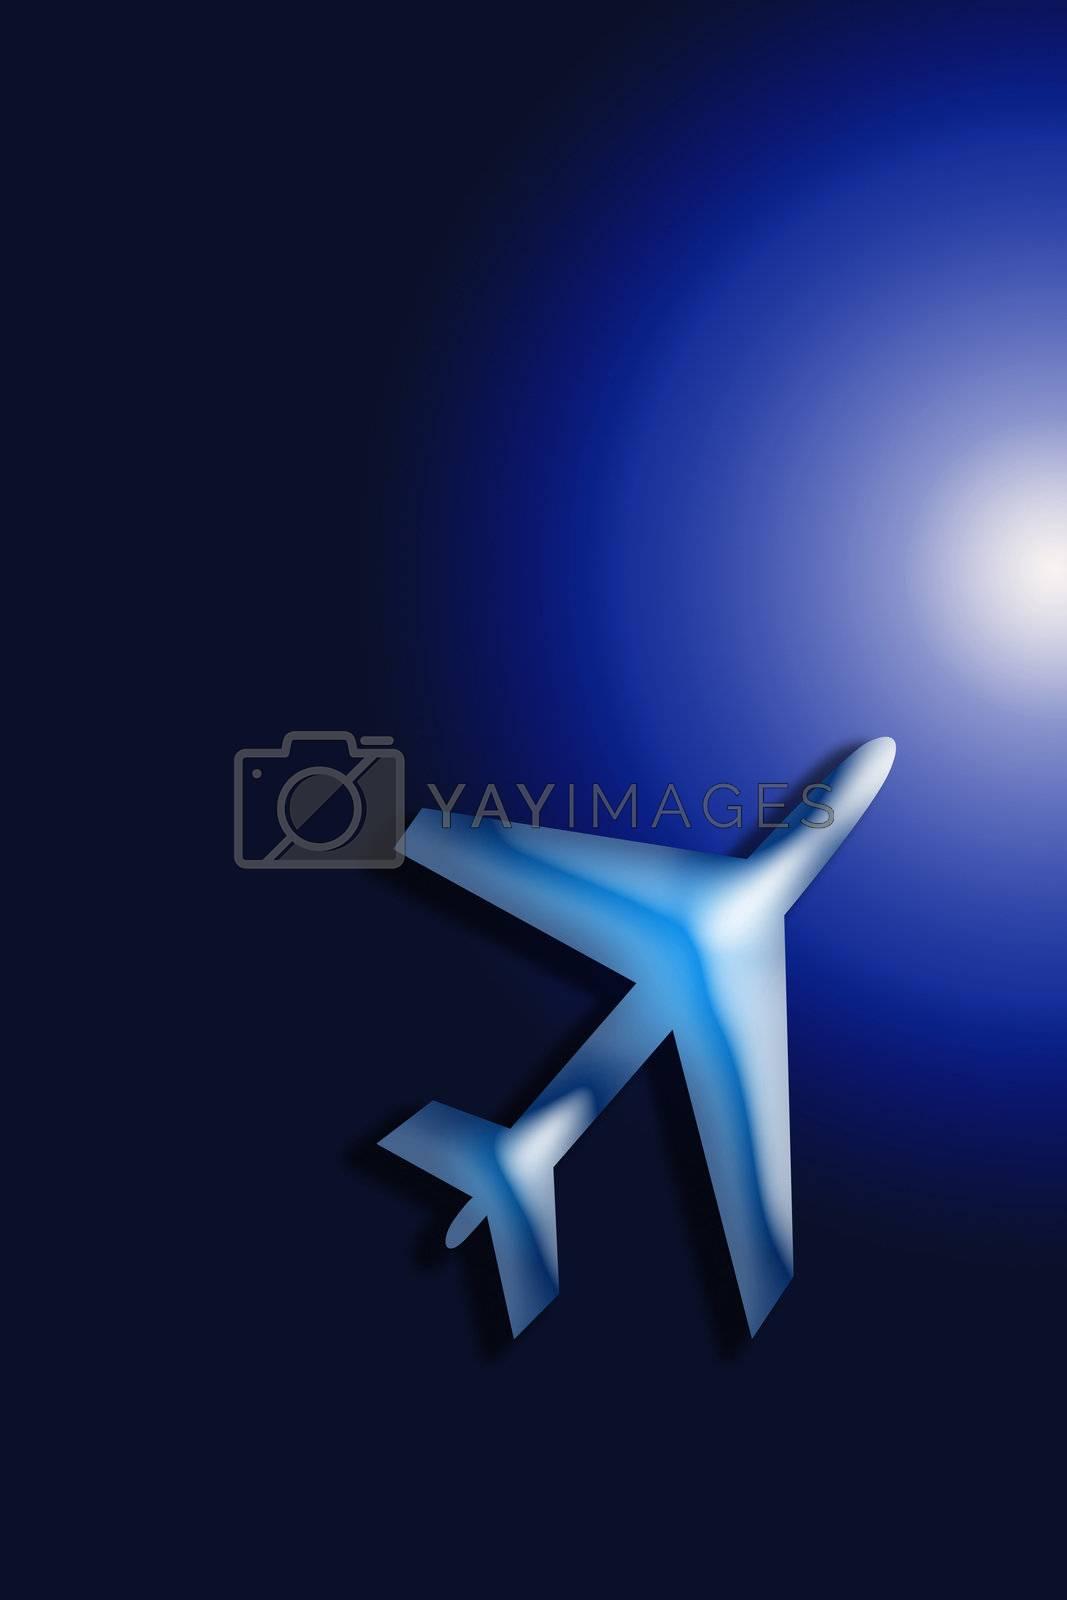 Passenger airplane in the blue sky landing away